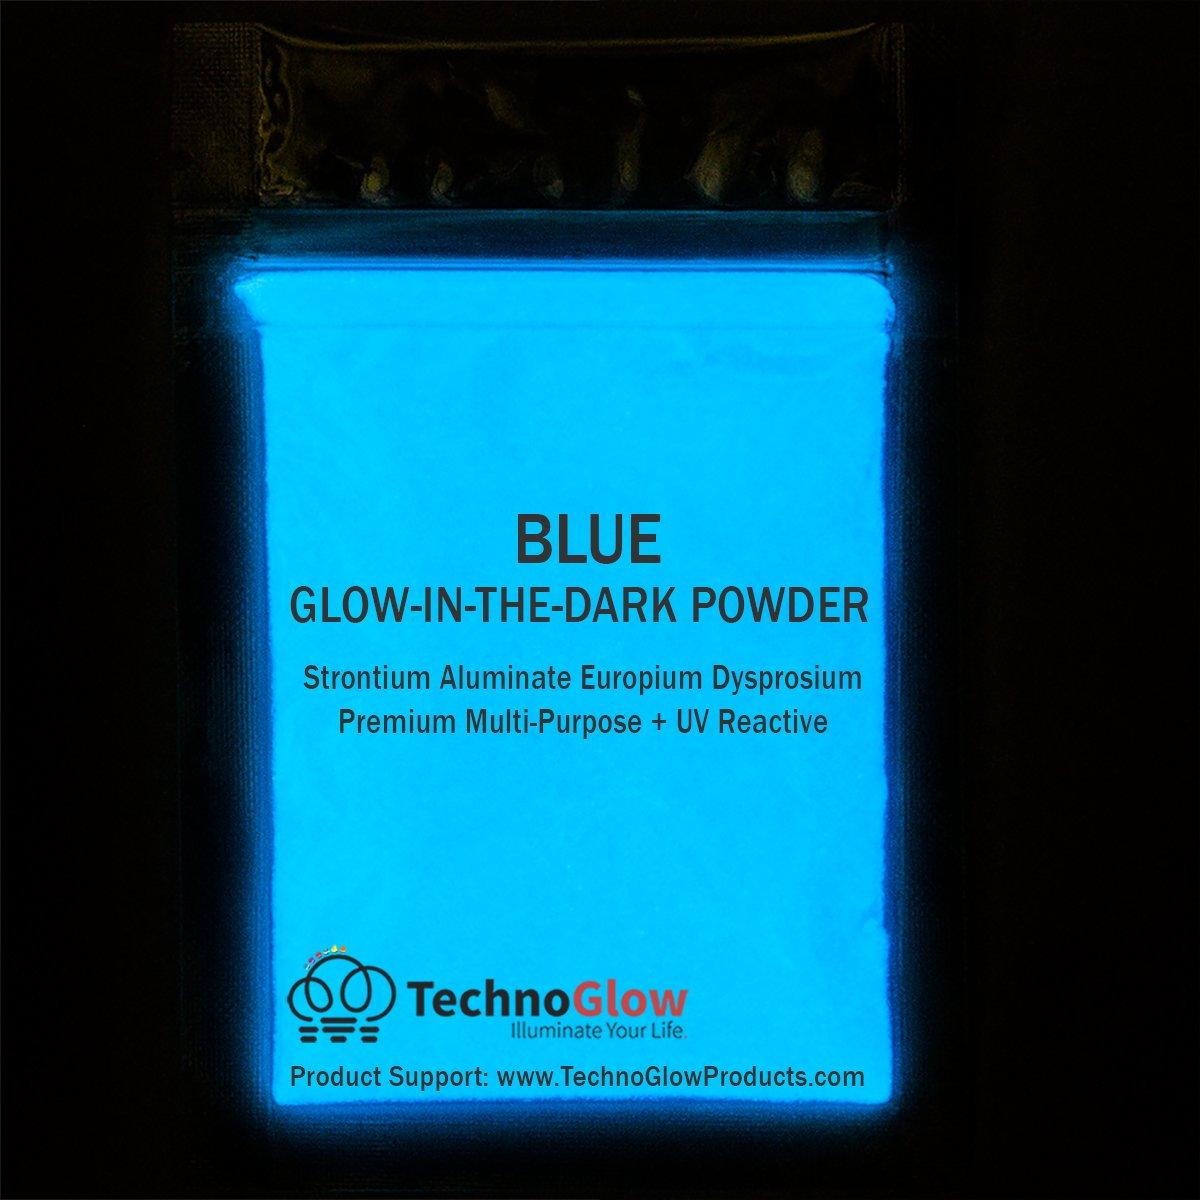 Blue Glow in the Dark & UV Reactive Pigment Powder - 500 Grams by Techno Glow Inc (Image #2)